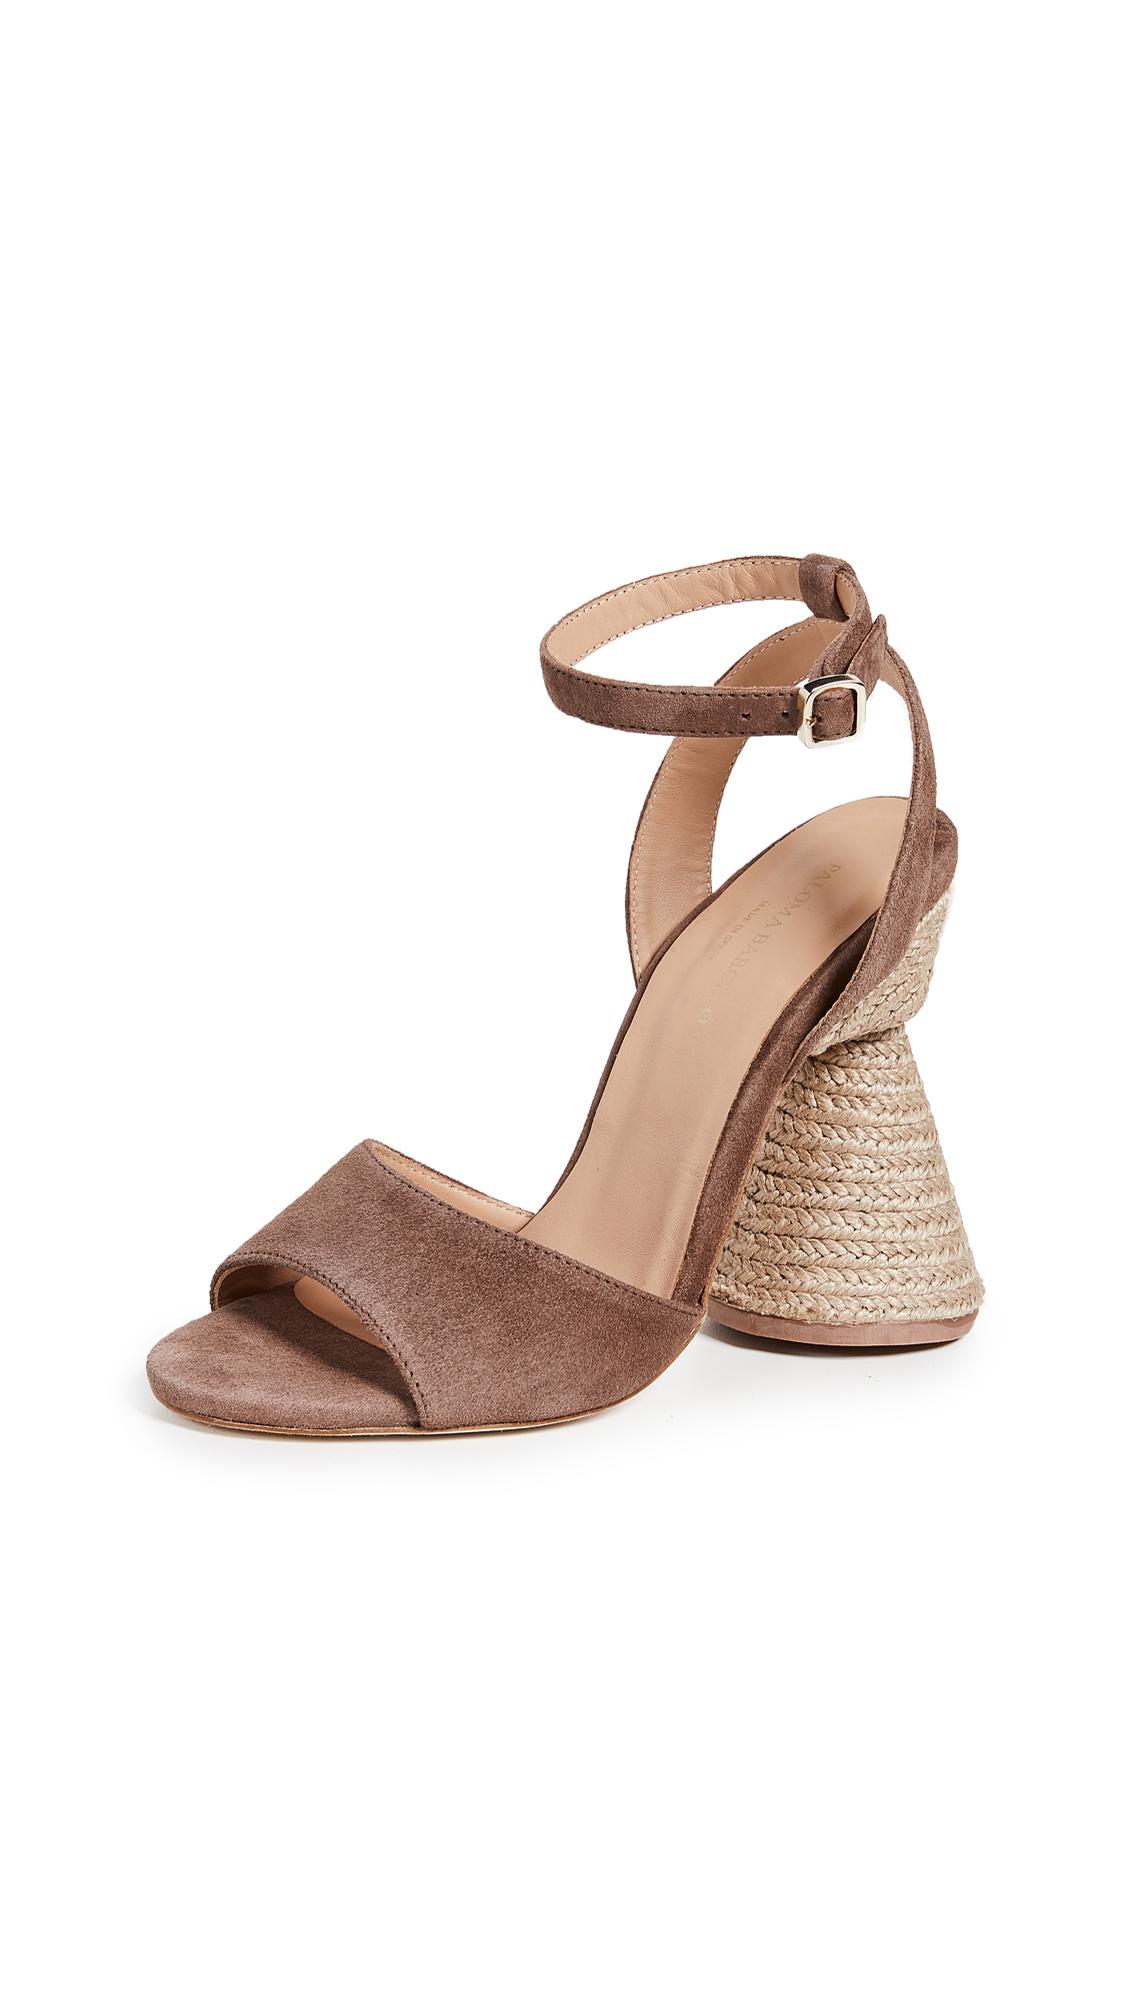 Paloma Barcelo Bilitis Cone Heel Sandals - Taupe